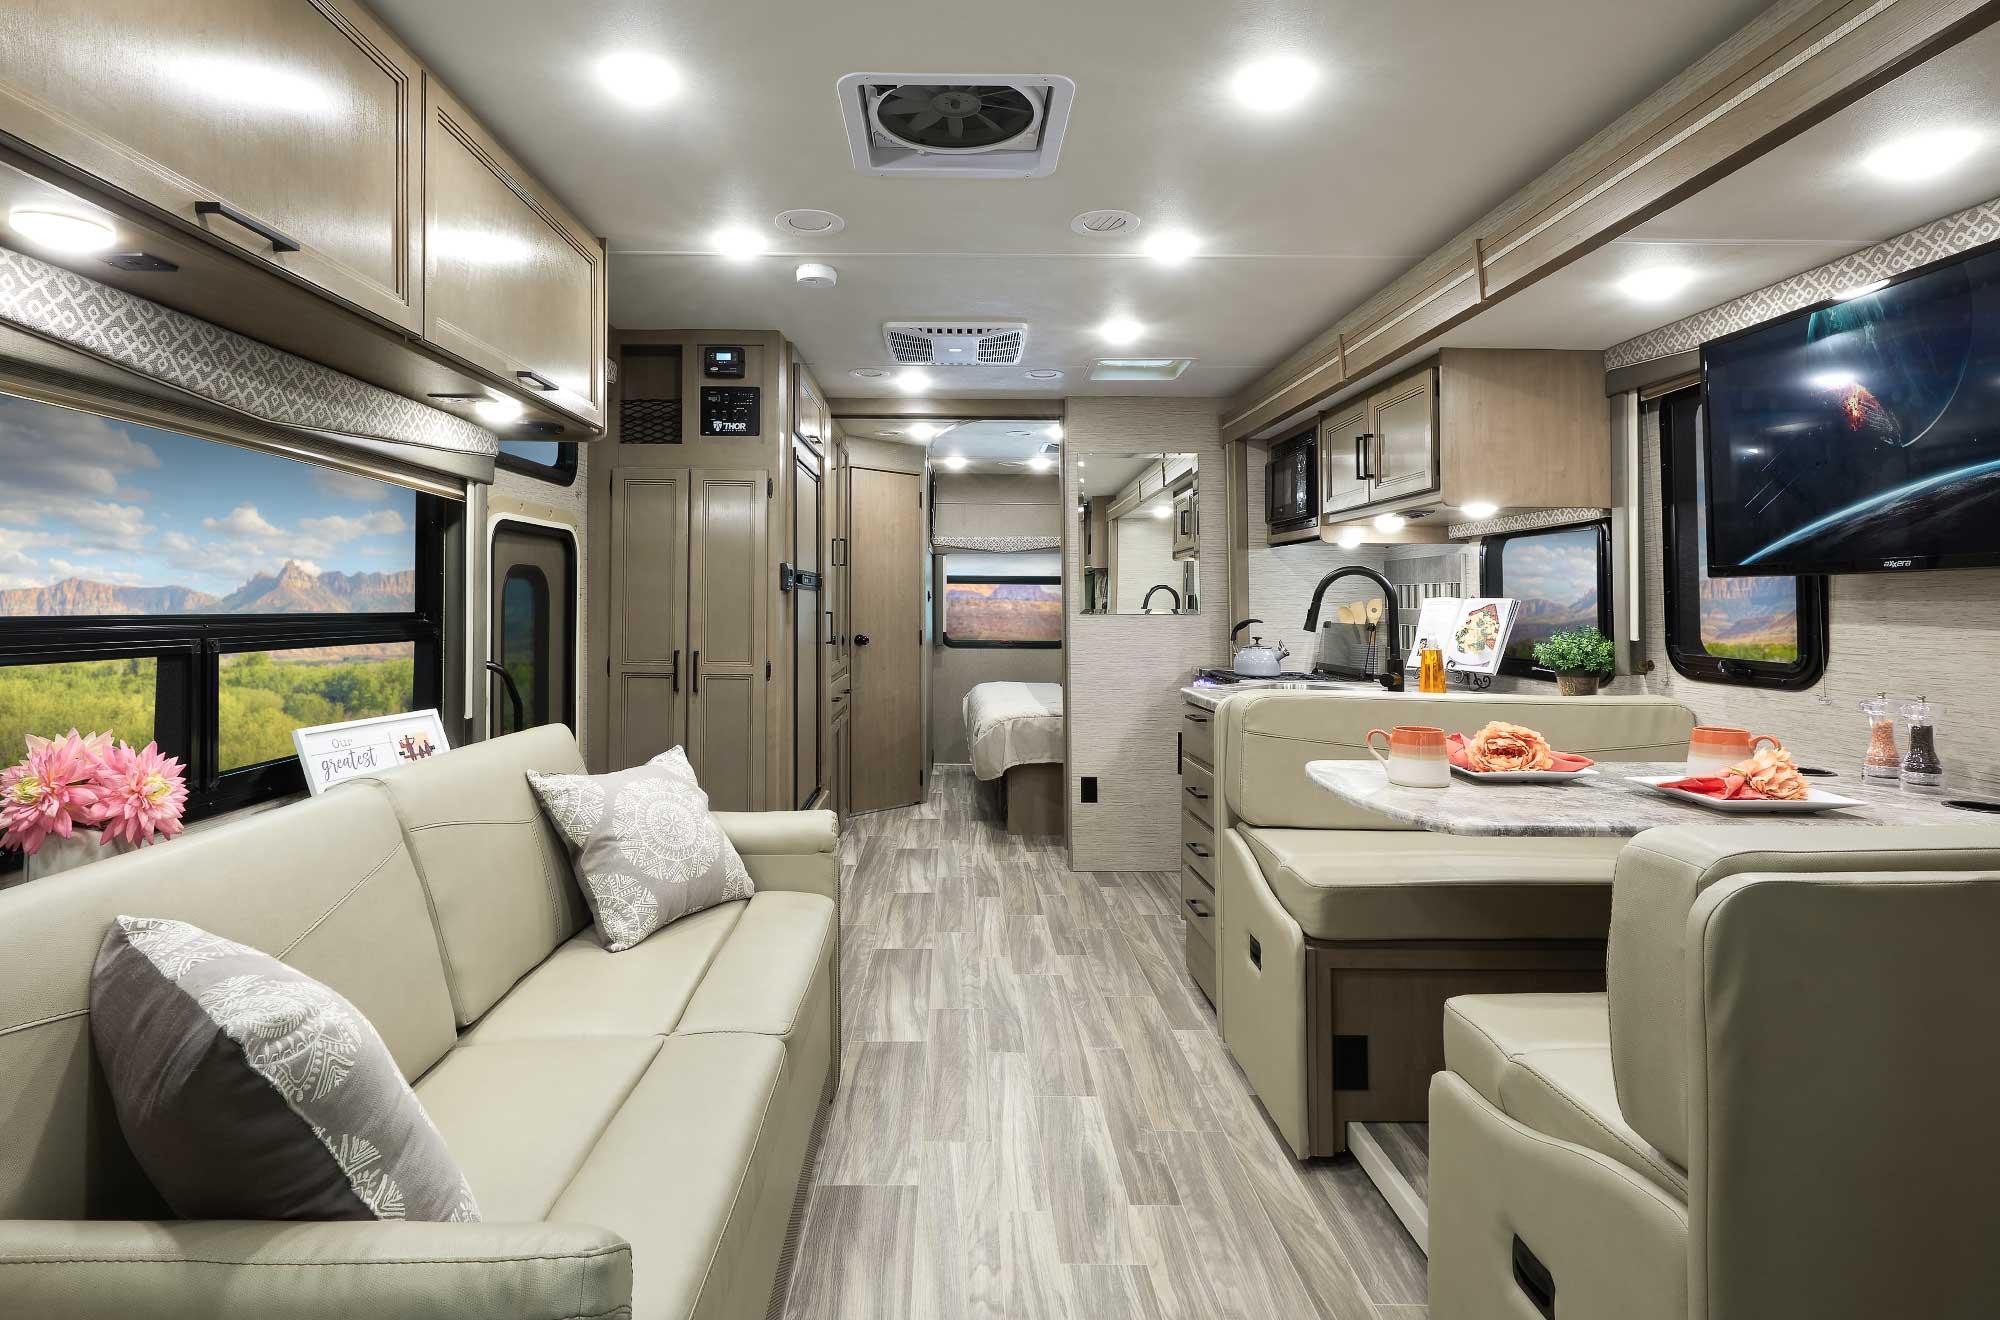 ACE Class A RV Interior